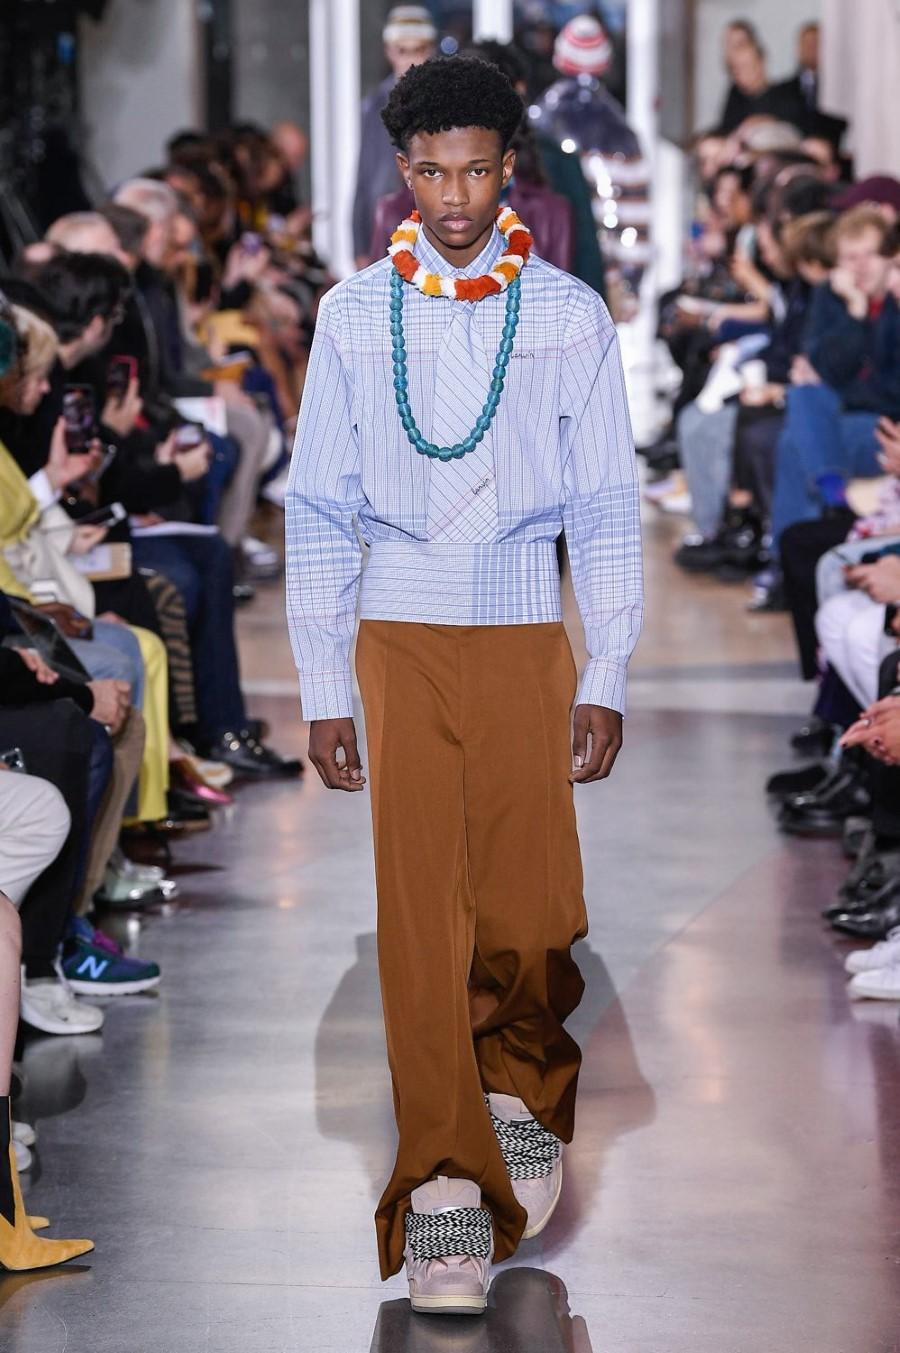 Lanvin - Fall Winter 2020 - Paris Fashion Week Men's